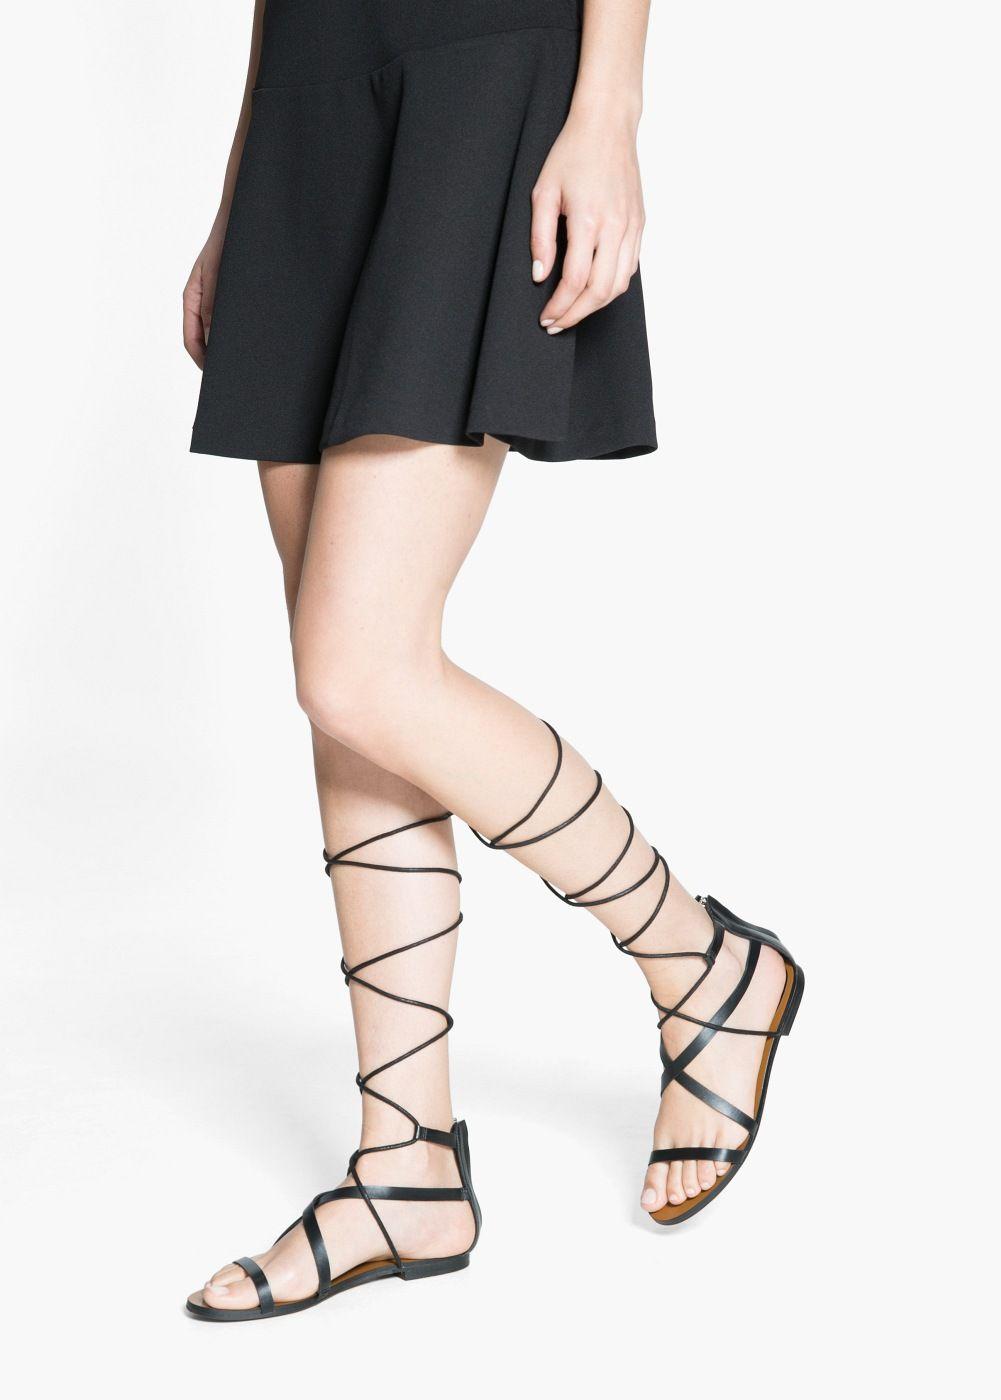 e1b43bfa950 Strap cord sandals - Women   WishList #thebest   Lace up sandals ...